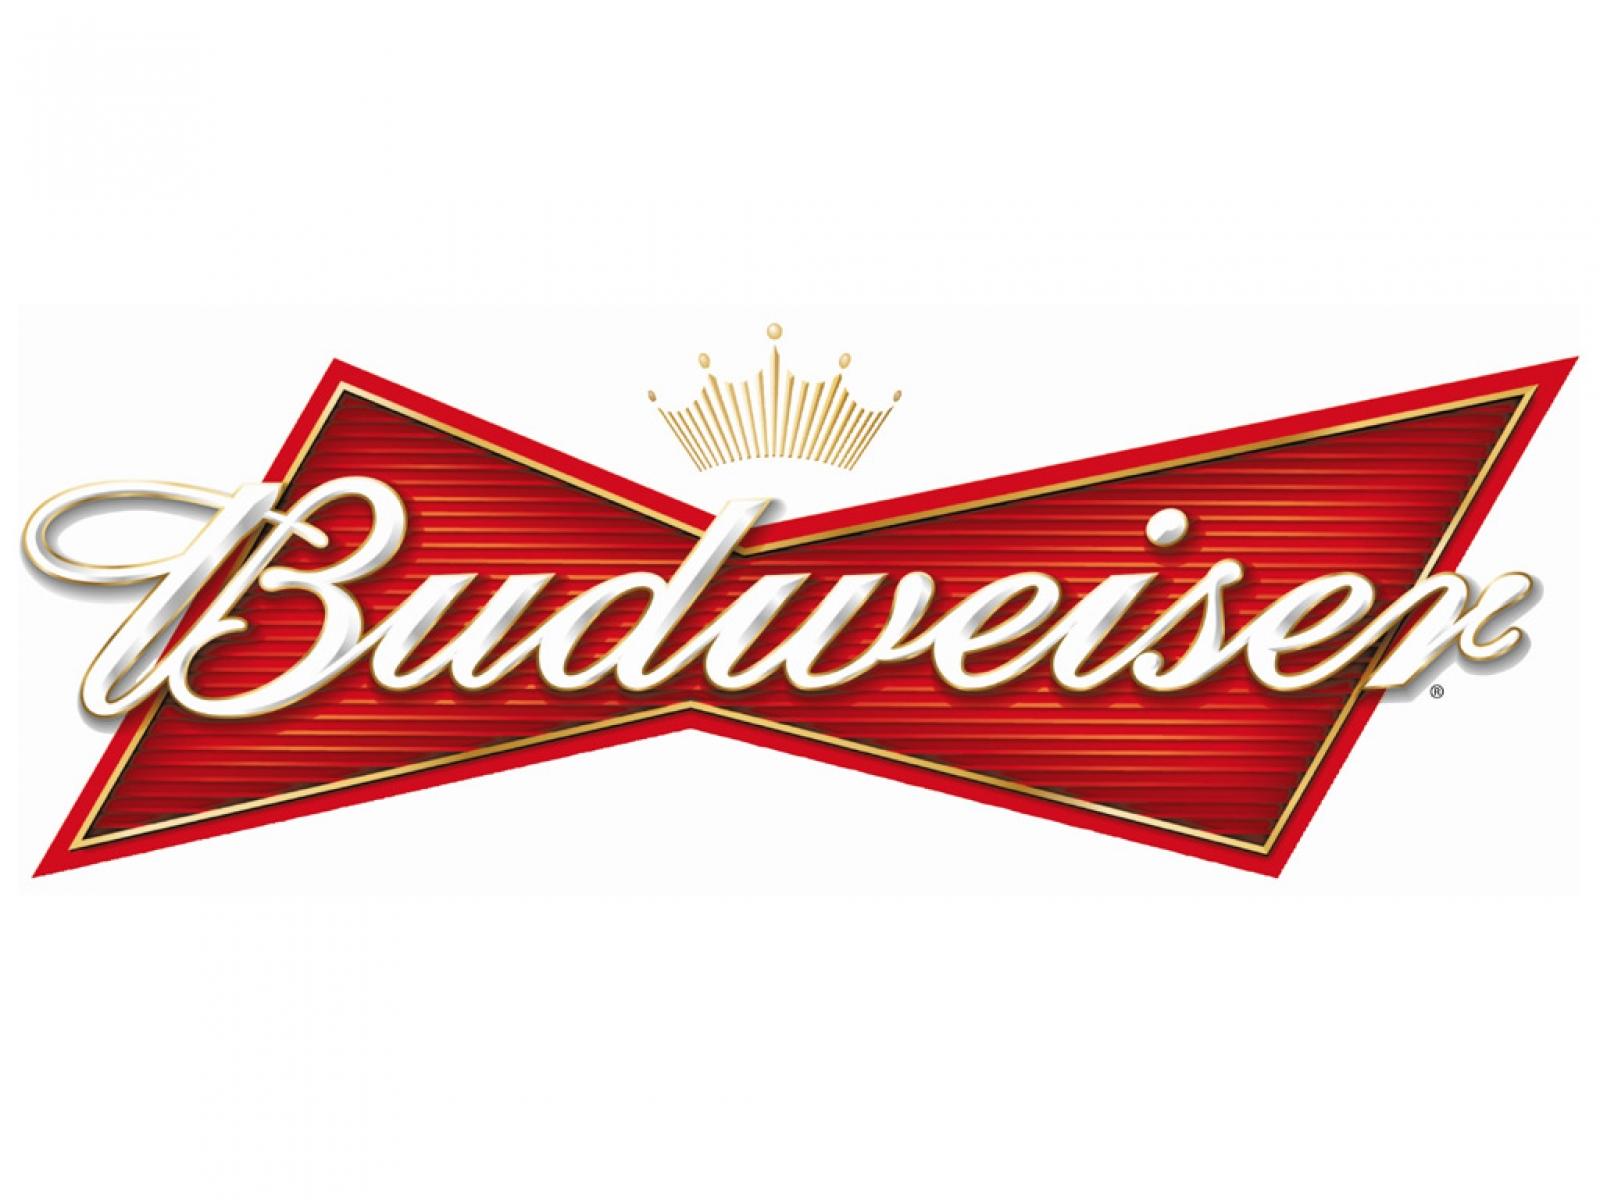 Budweiser-1600-1200.jpg